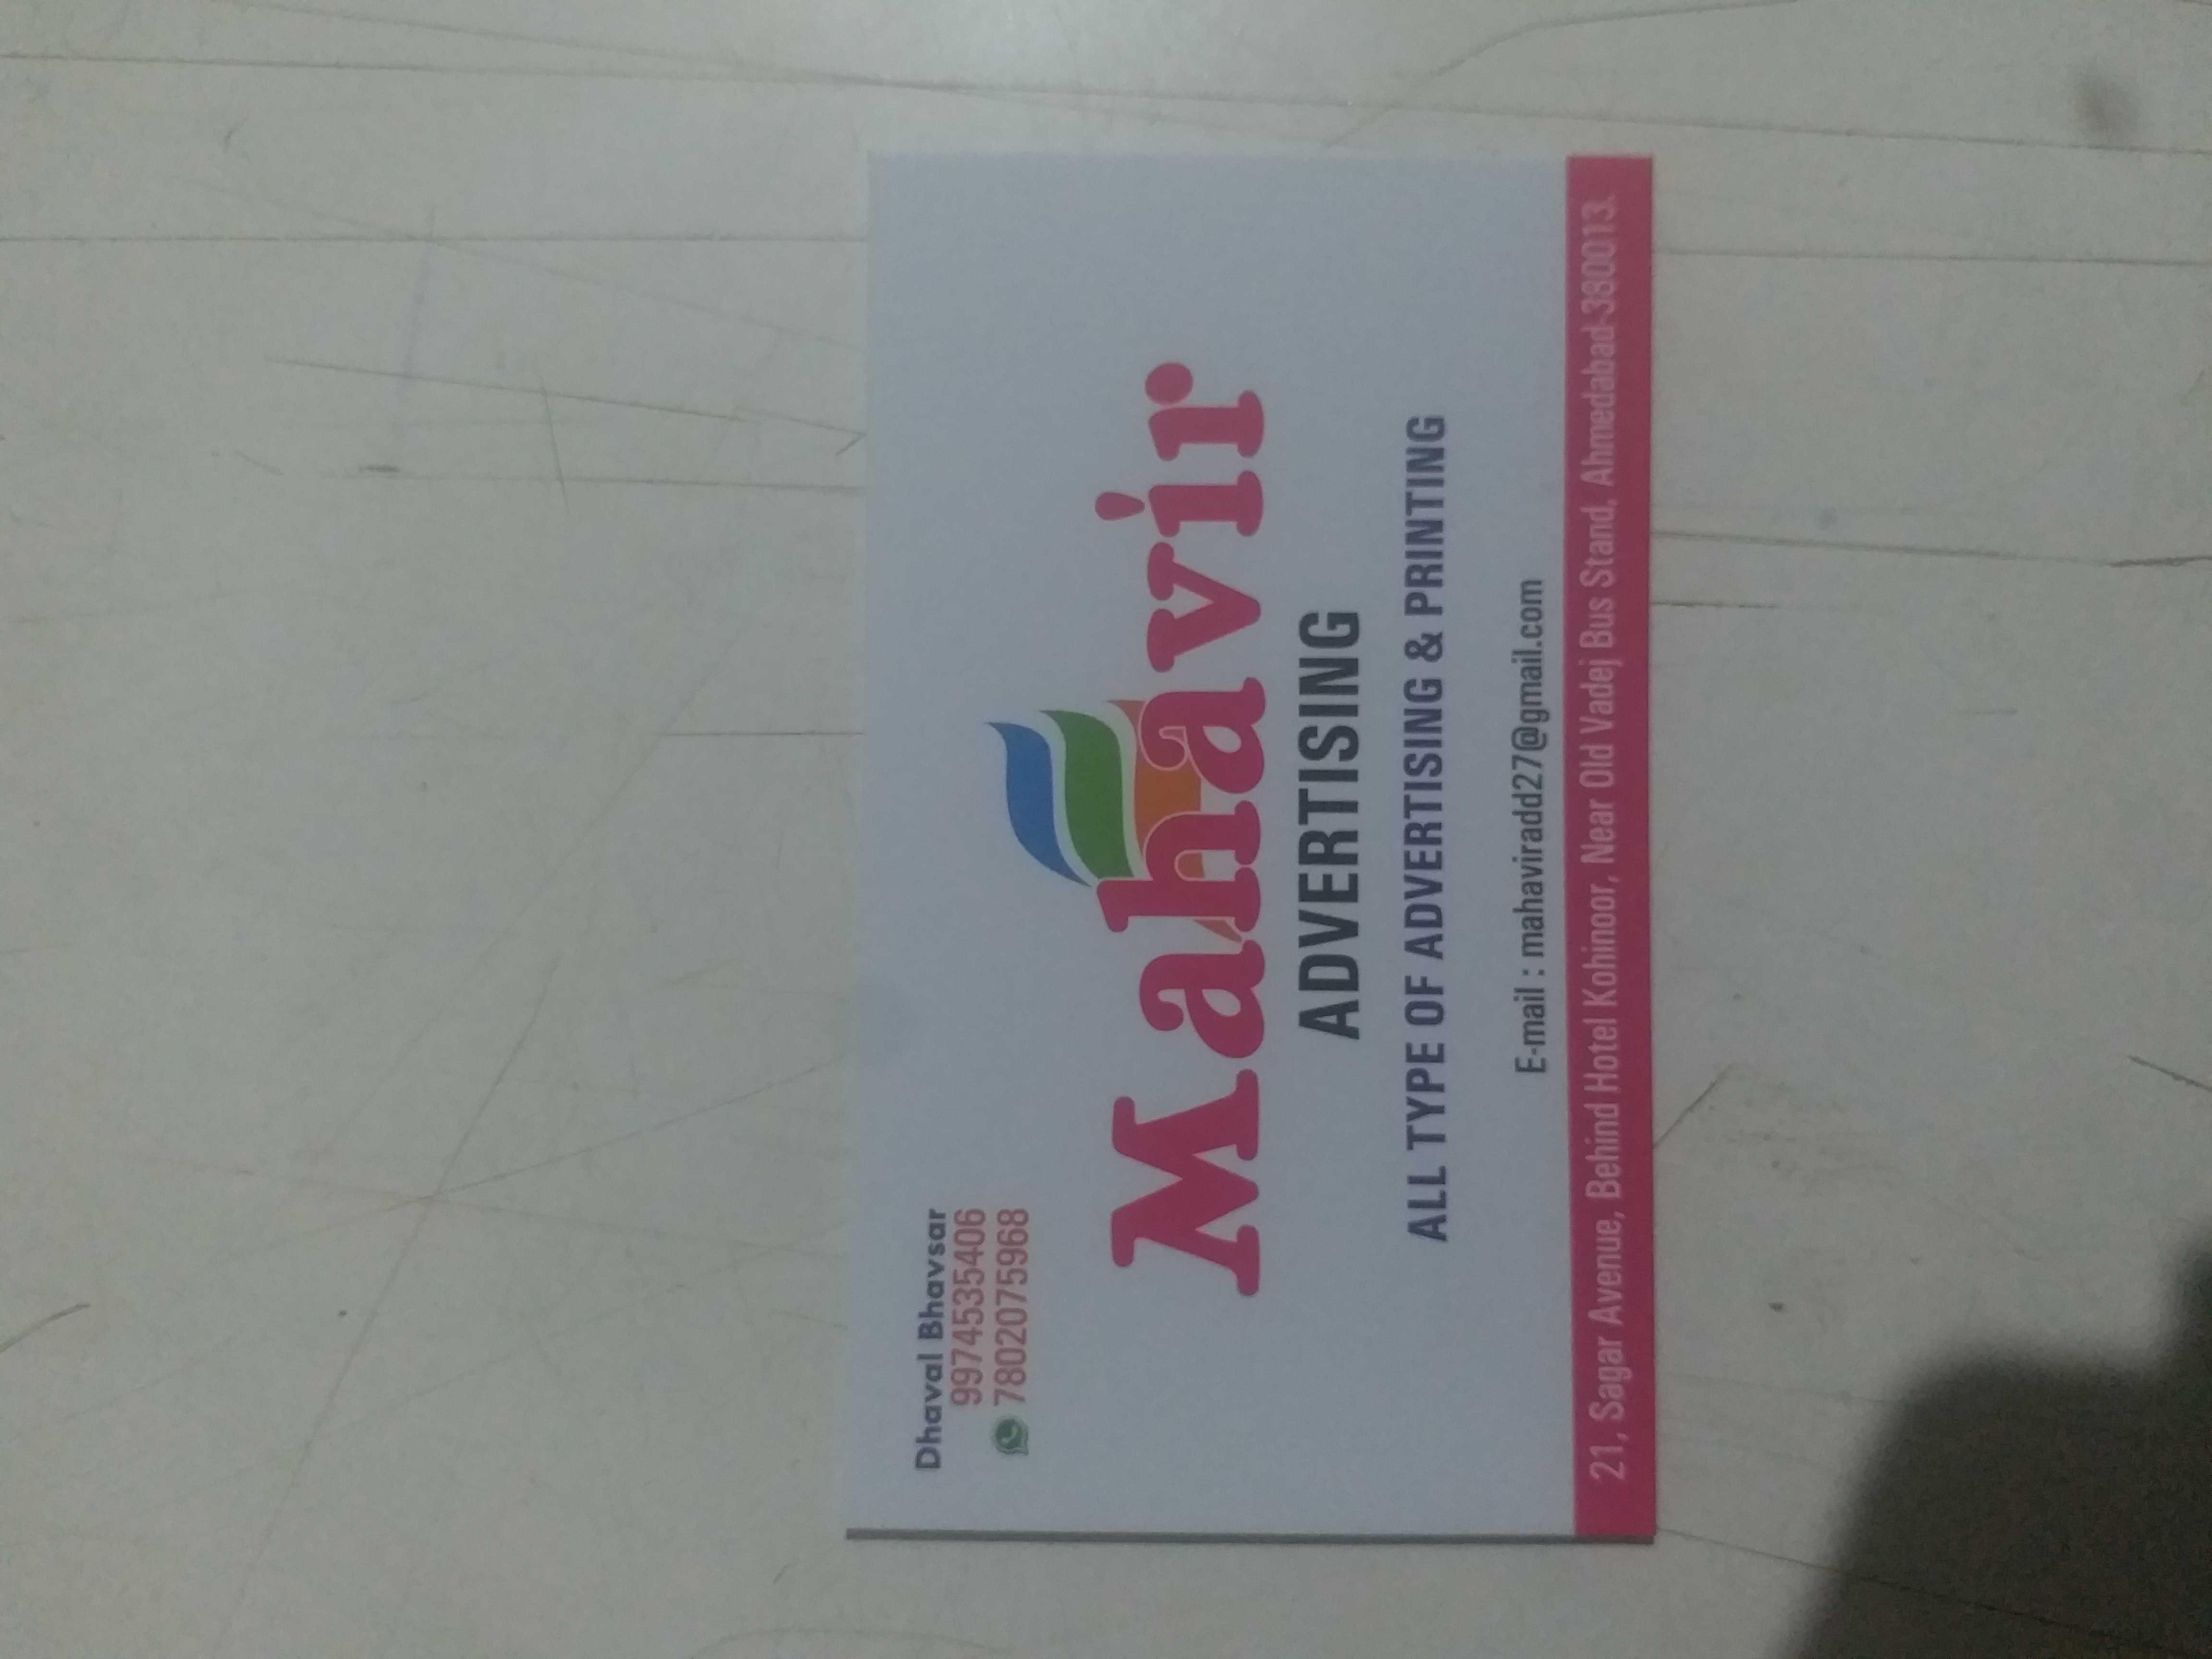 Mahavir Advertising in Usmanpura, Ahmedabad-380013   Sulekha